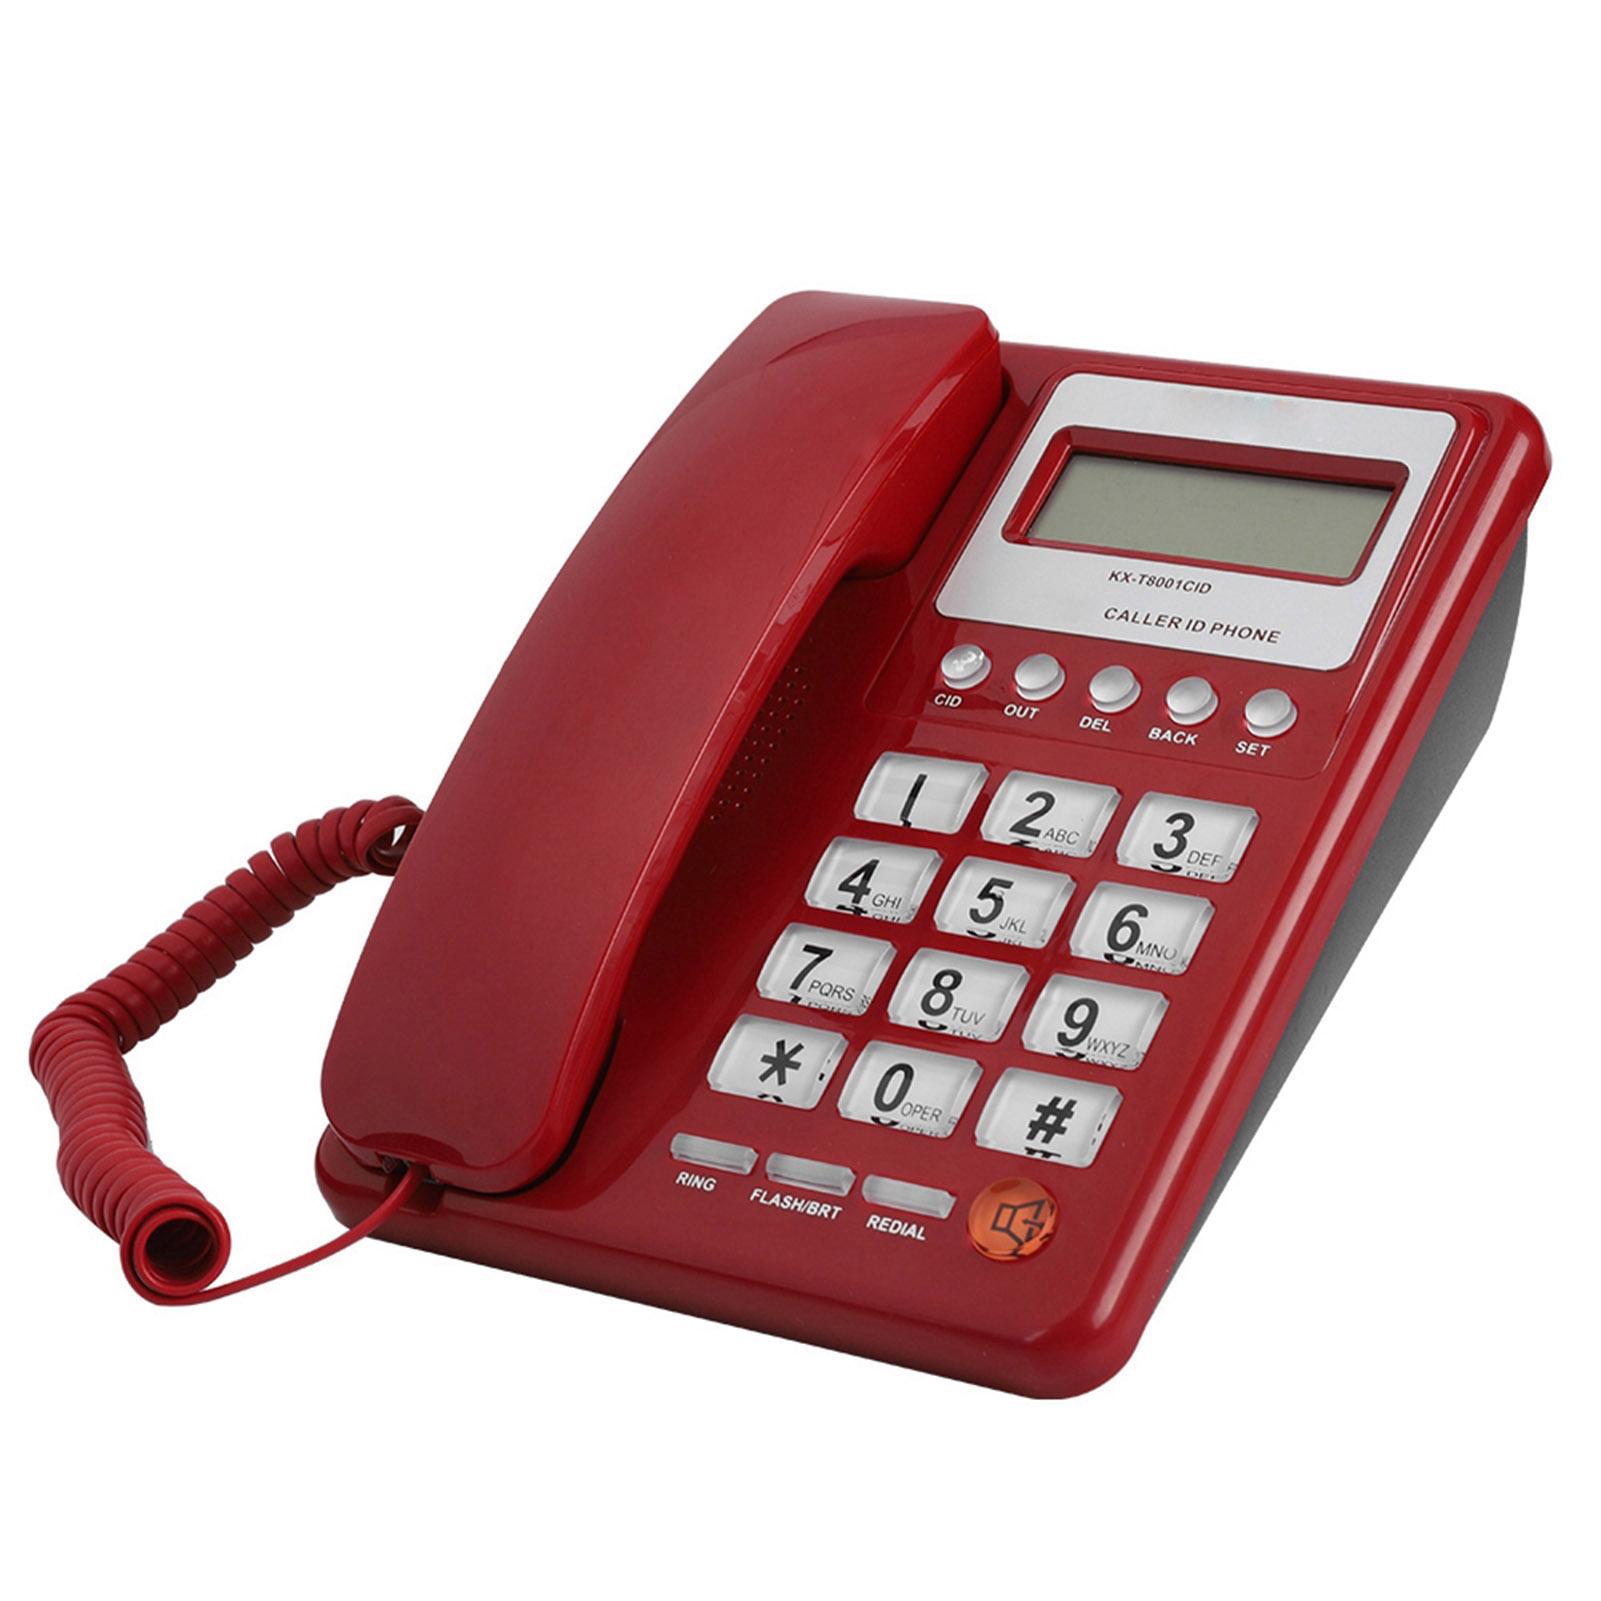 Desktop Corded Telephone Landline Home Office Phone With